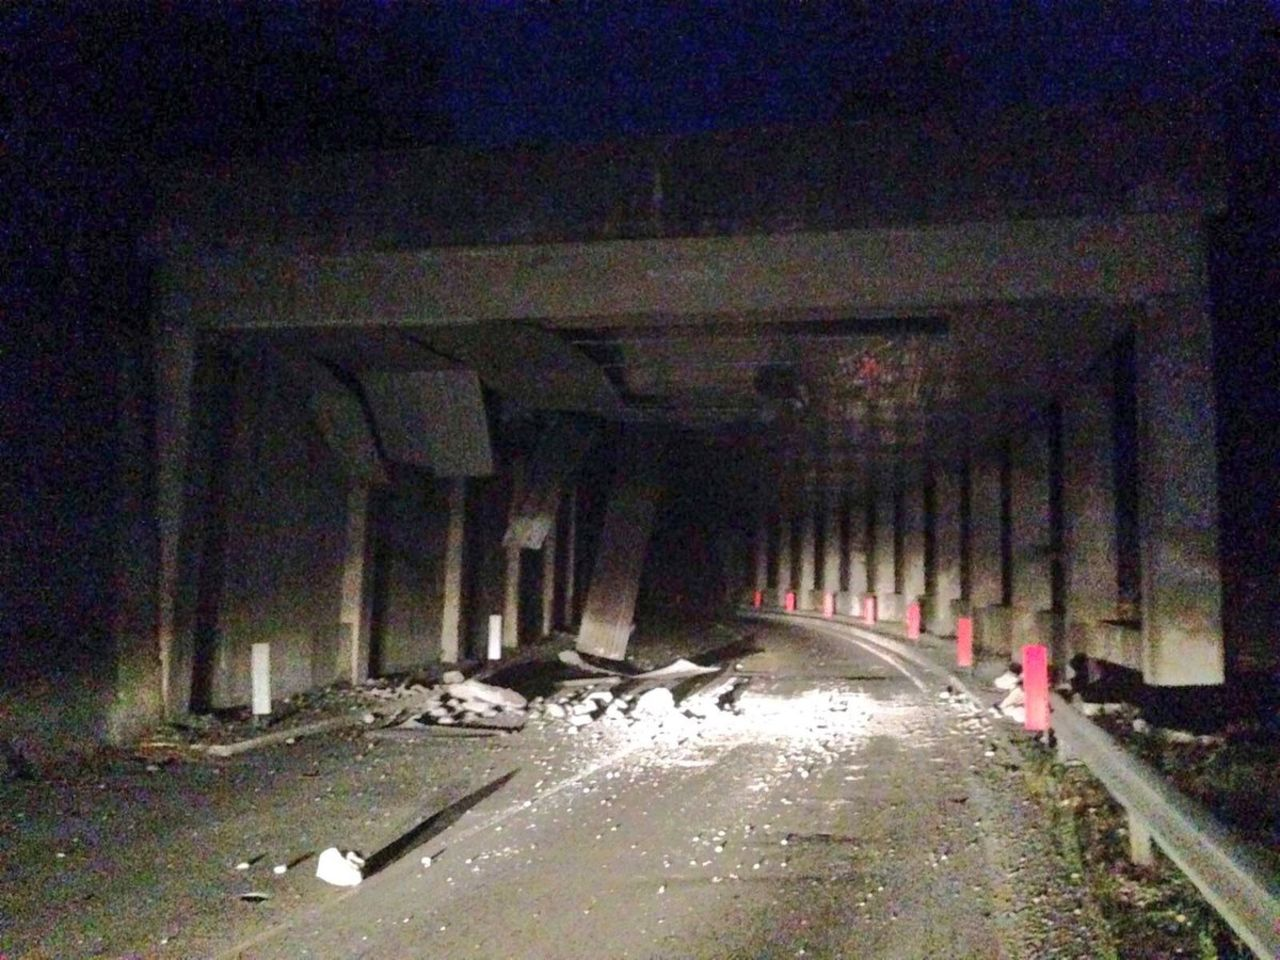 Землетрясение вИталии: мэр Аматриче объявил оразрушении «половины города»